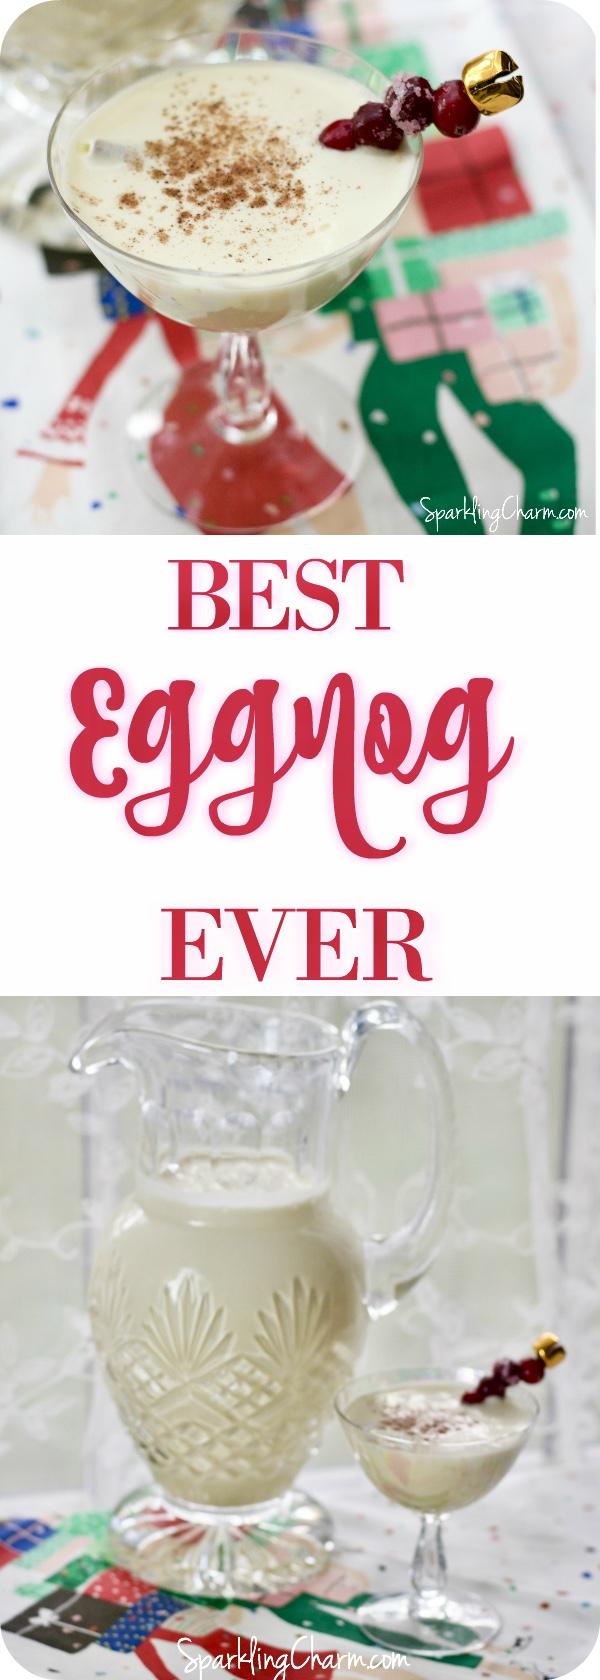 Christmas on the Flint River Eggnog, The Best Homemade Eggnog Ever